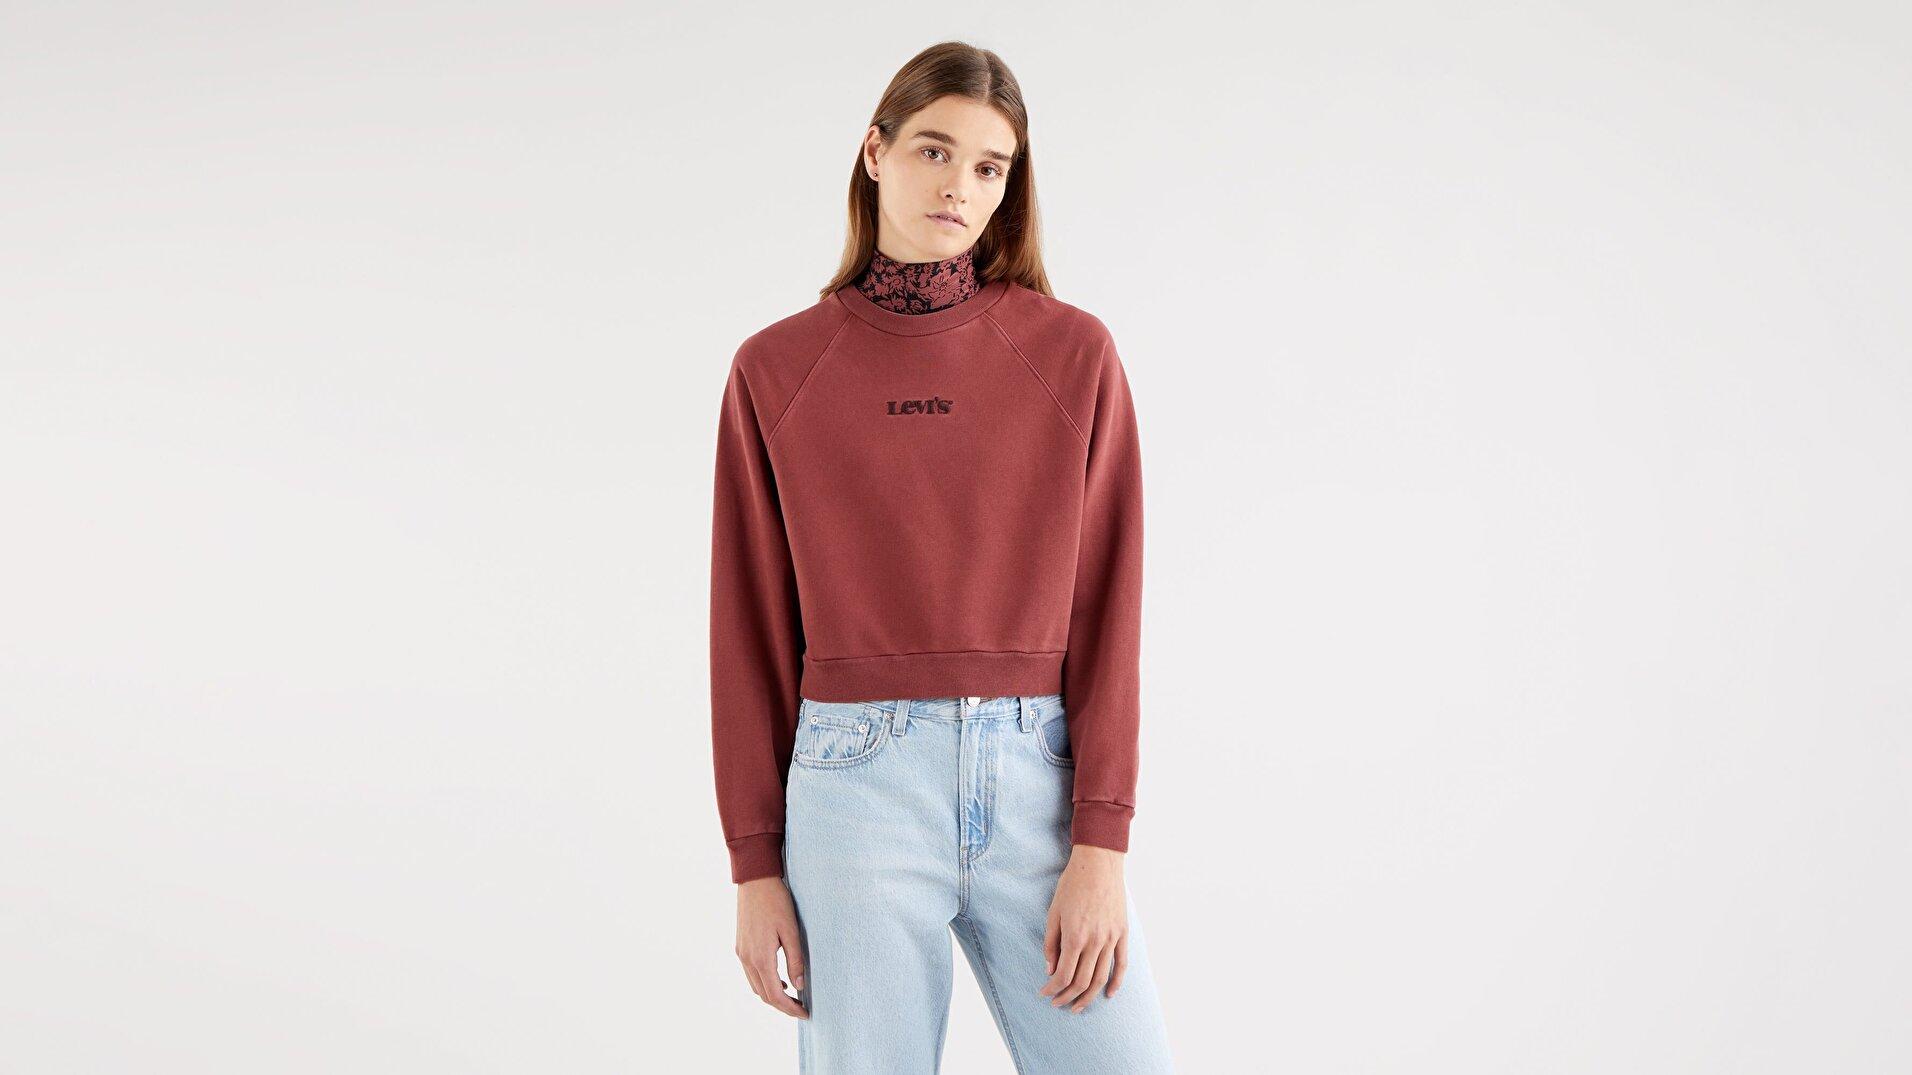 Vintage Raglan Crew Madder Brown Garment Kahverengi Kadın Sweatshirt